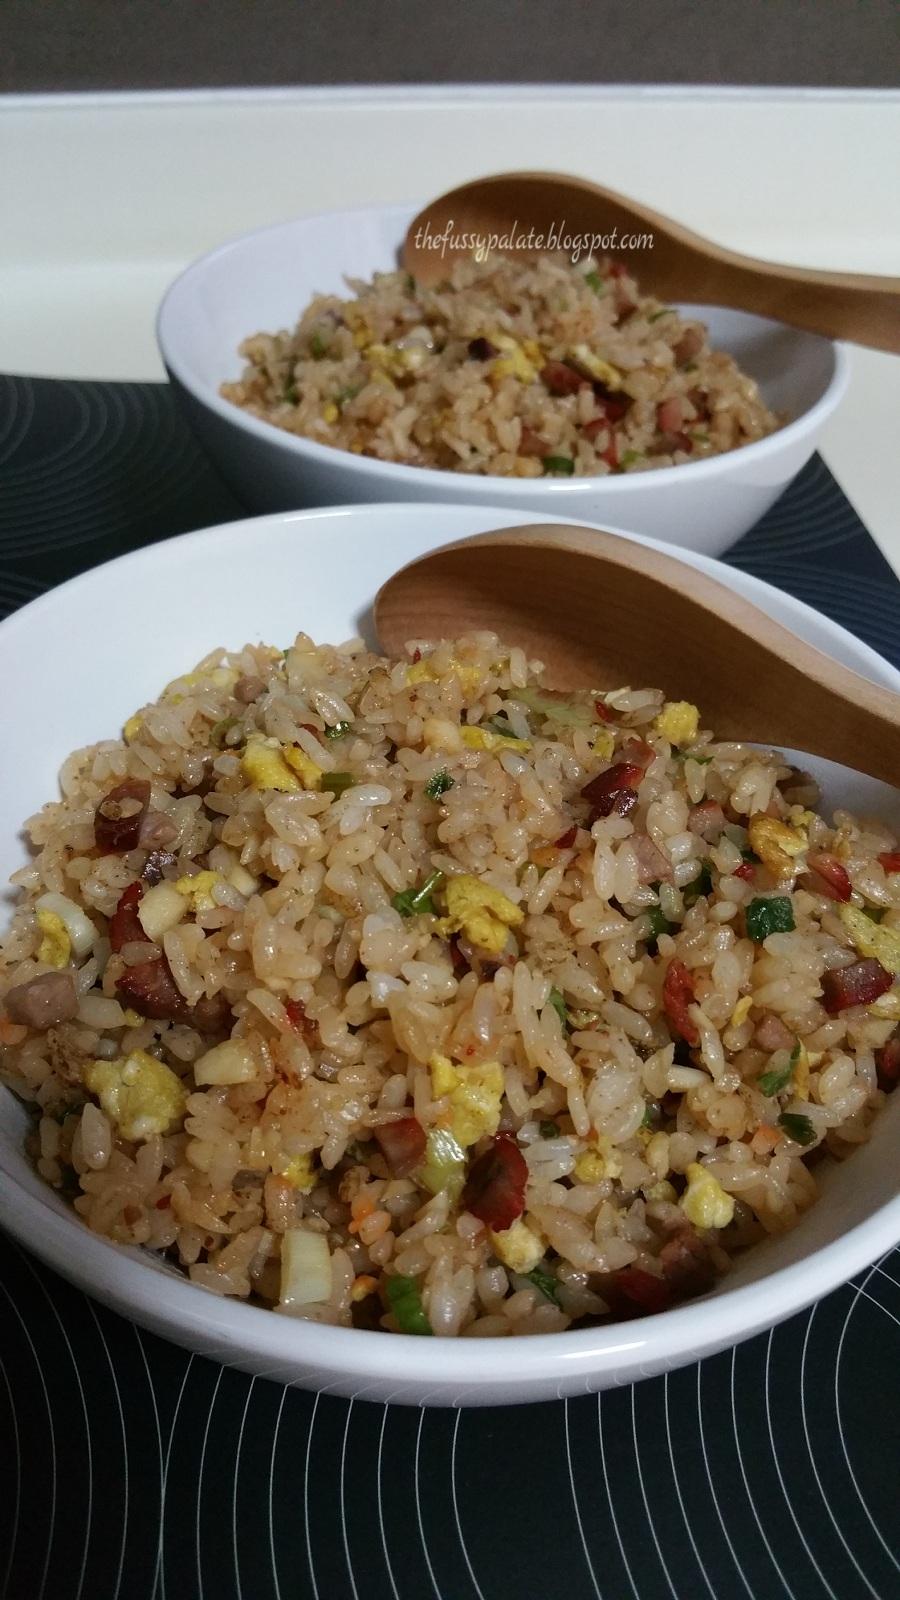 The fussy palate japanese garlic fried rice japanese garlic fried rice ccuart Image collections